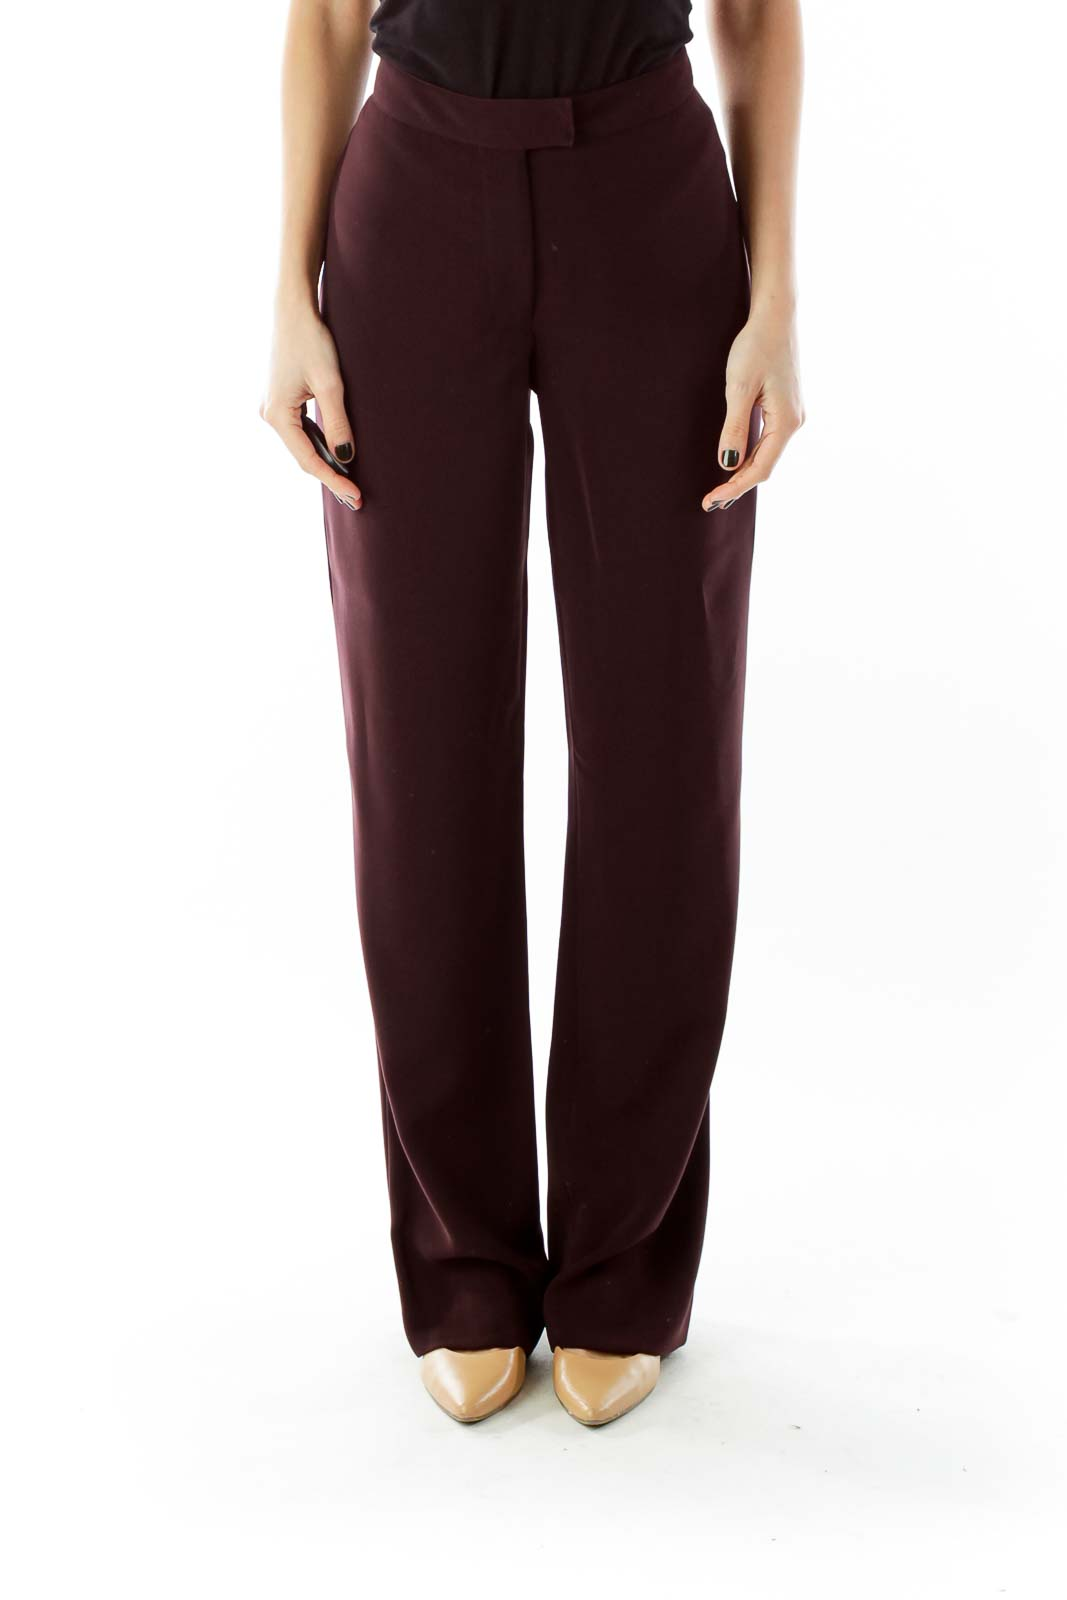 Purple High Waisted Suit Pants